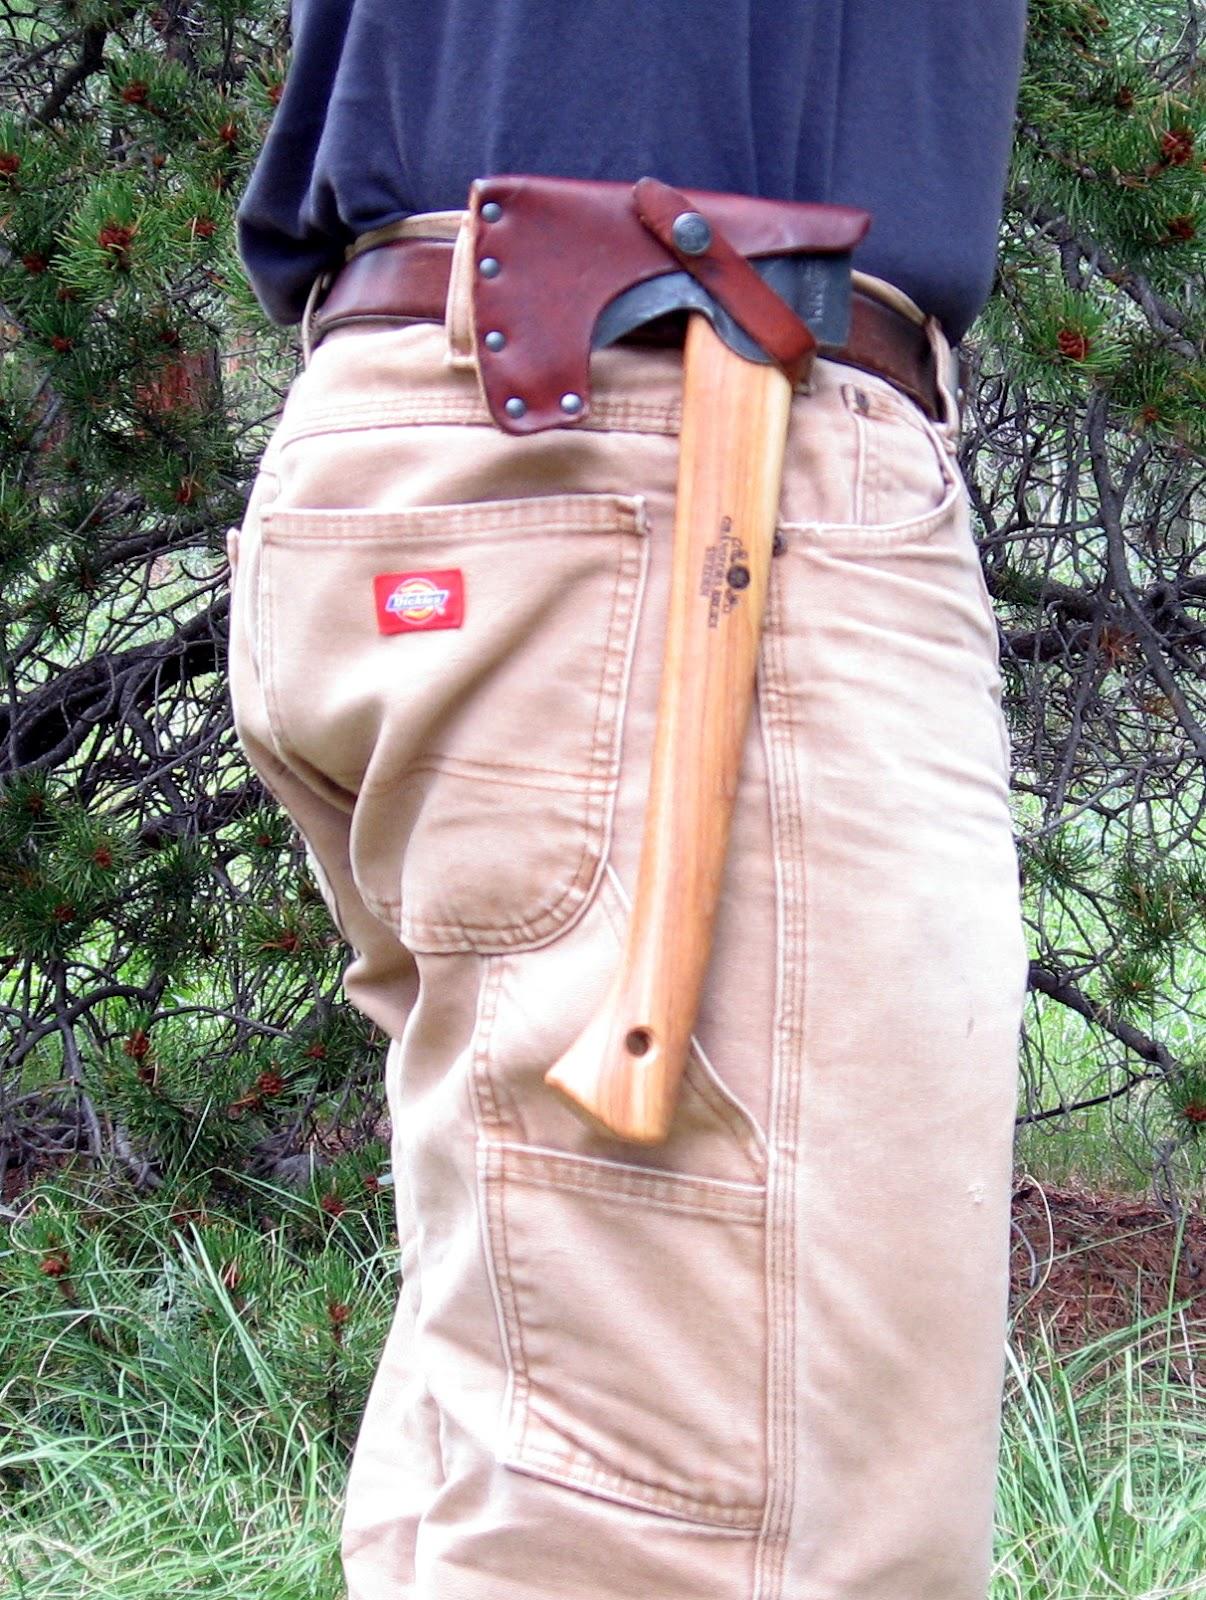 Rocky Mountain Bushcraft: REVIEW: The Gransfors Bruks Wildlife